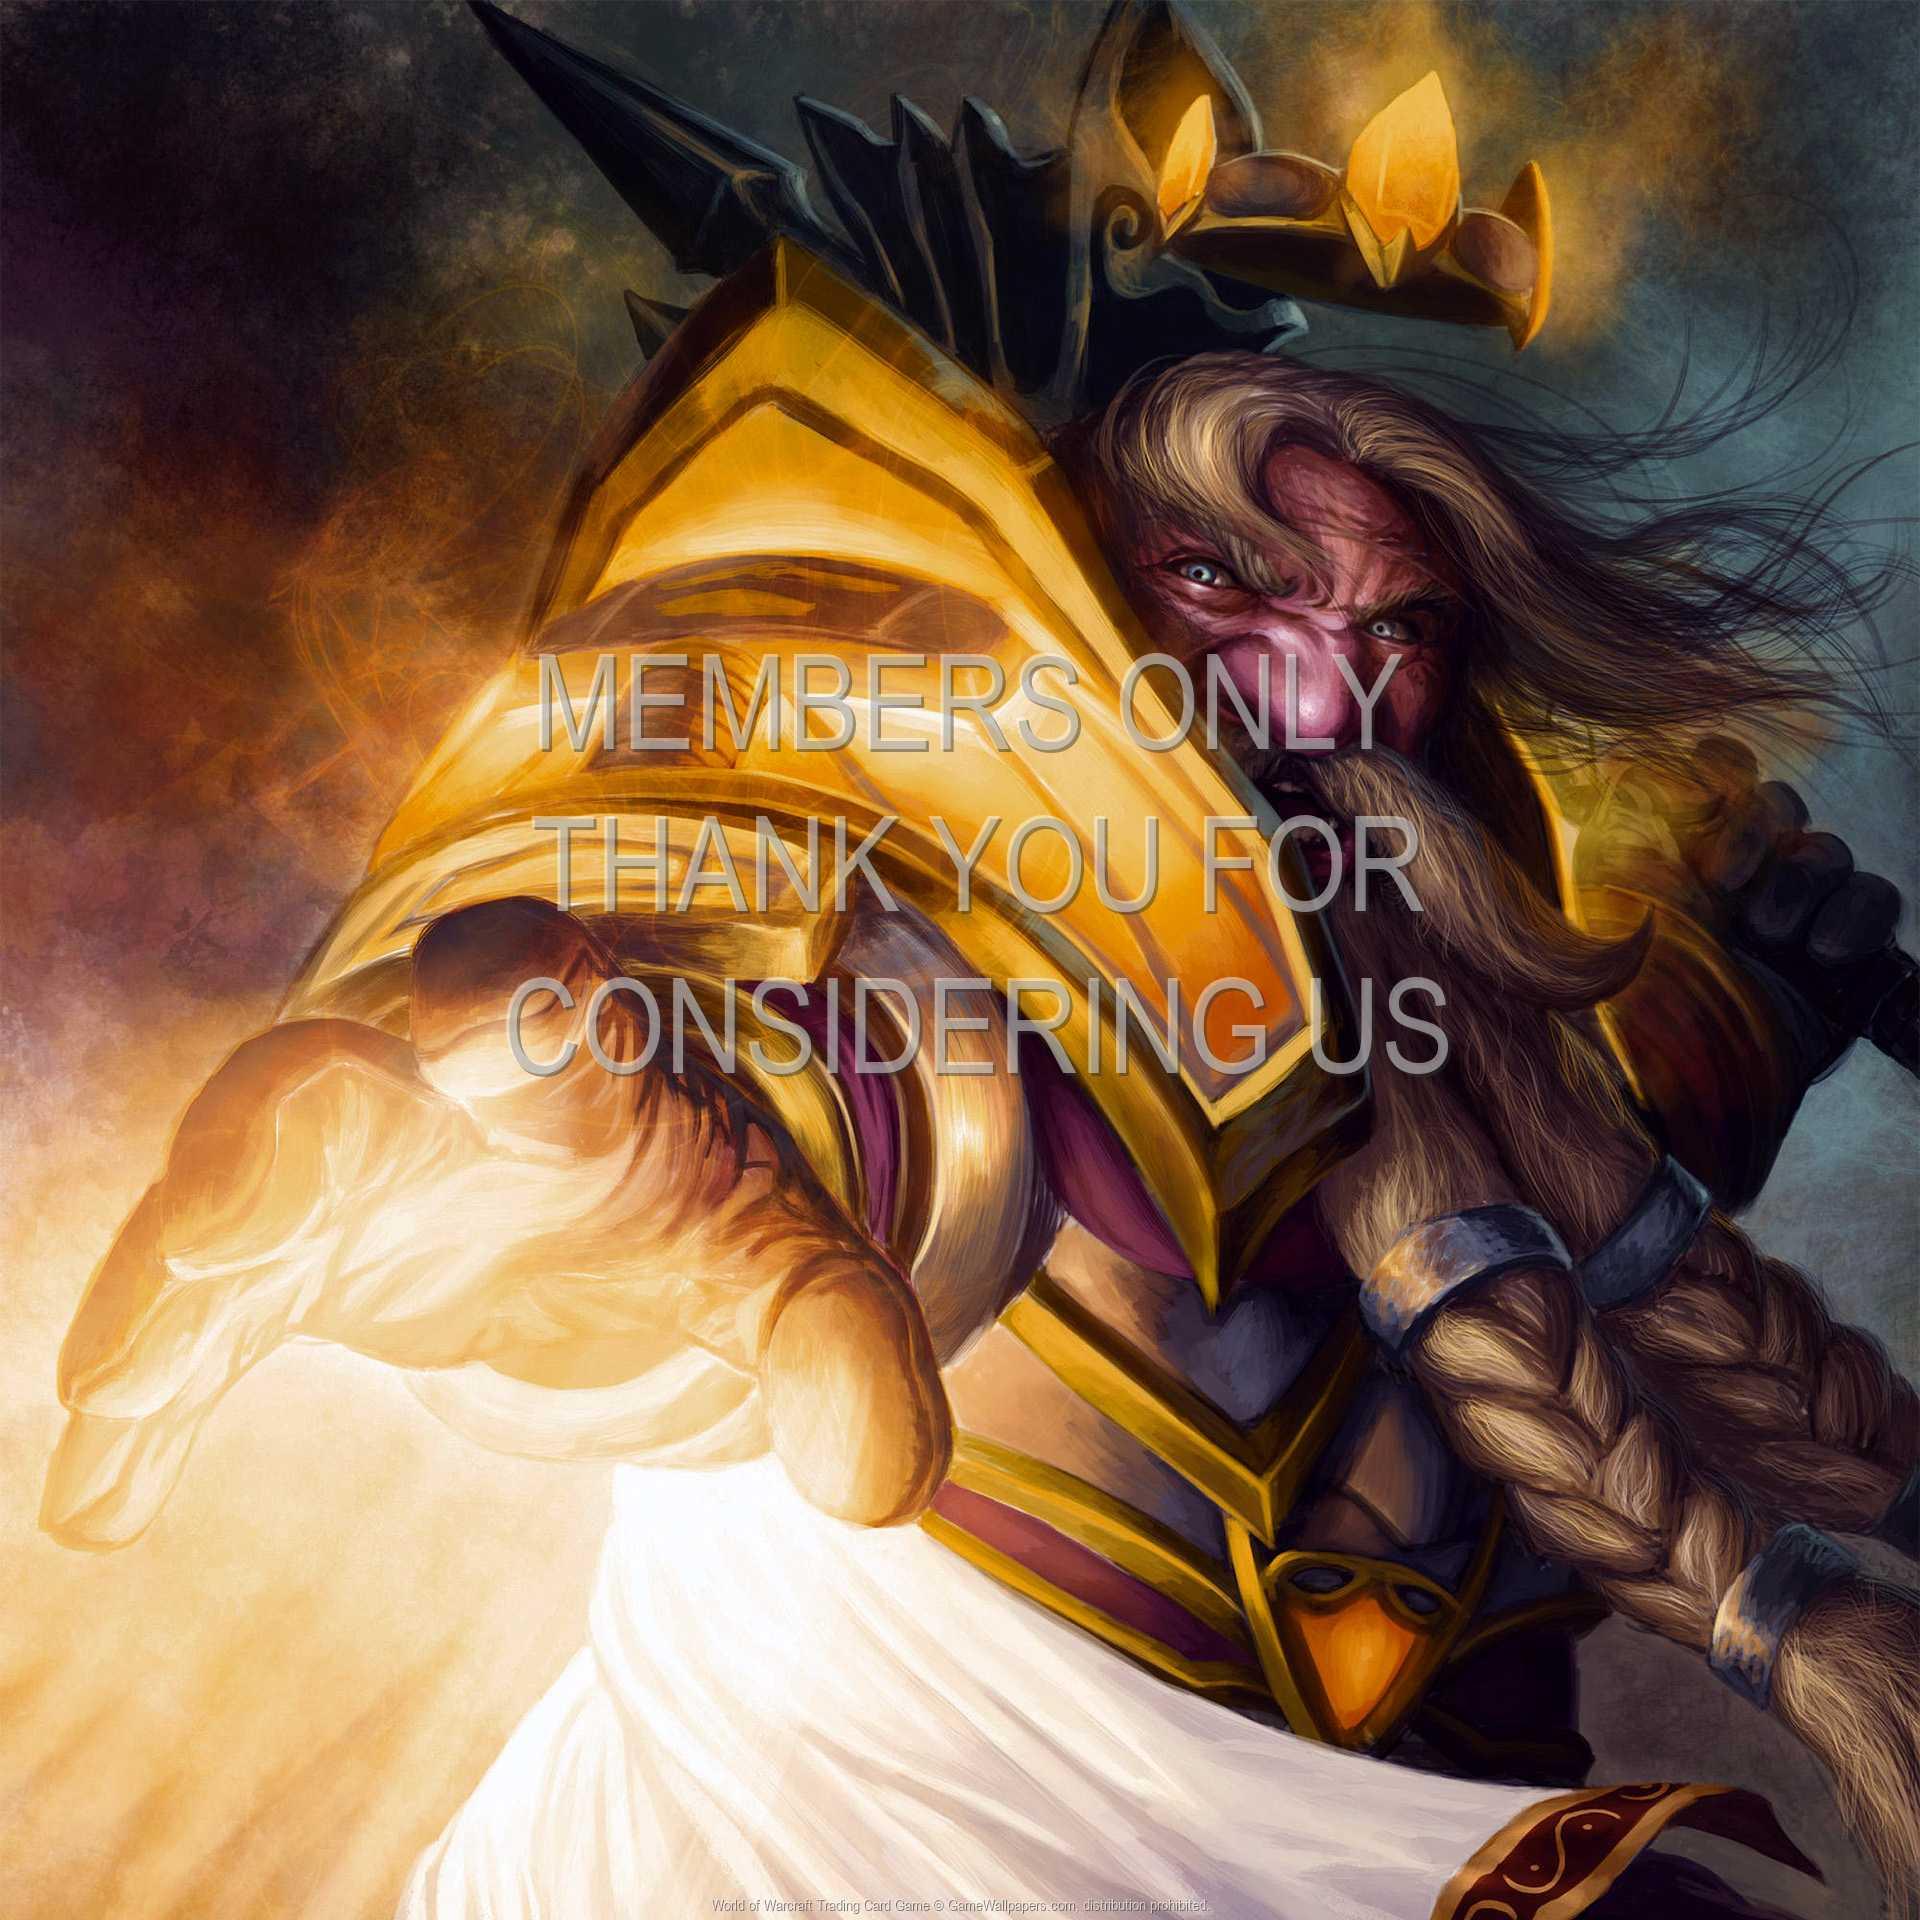 World of Warcraft: Trading Card Game 1080p Horizontal Handy Hintergrundbild 35